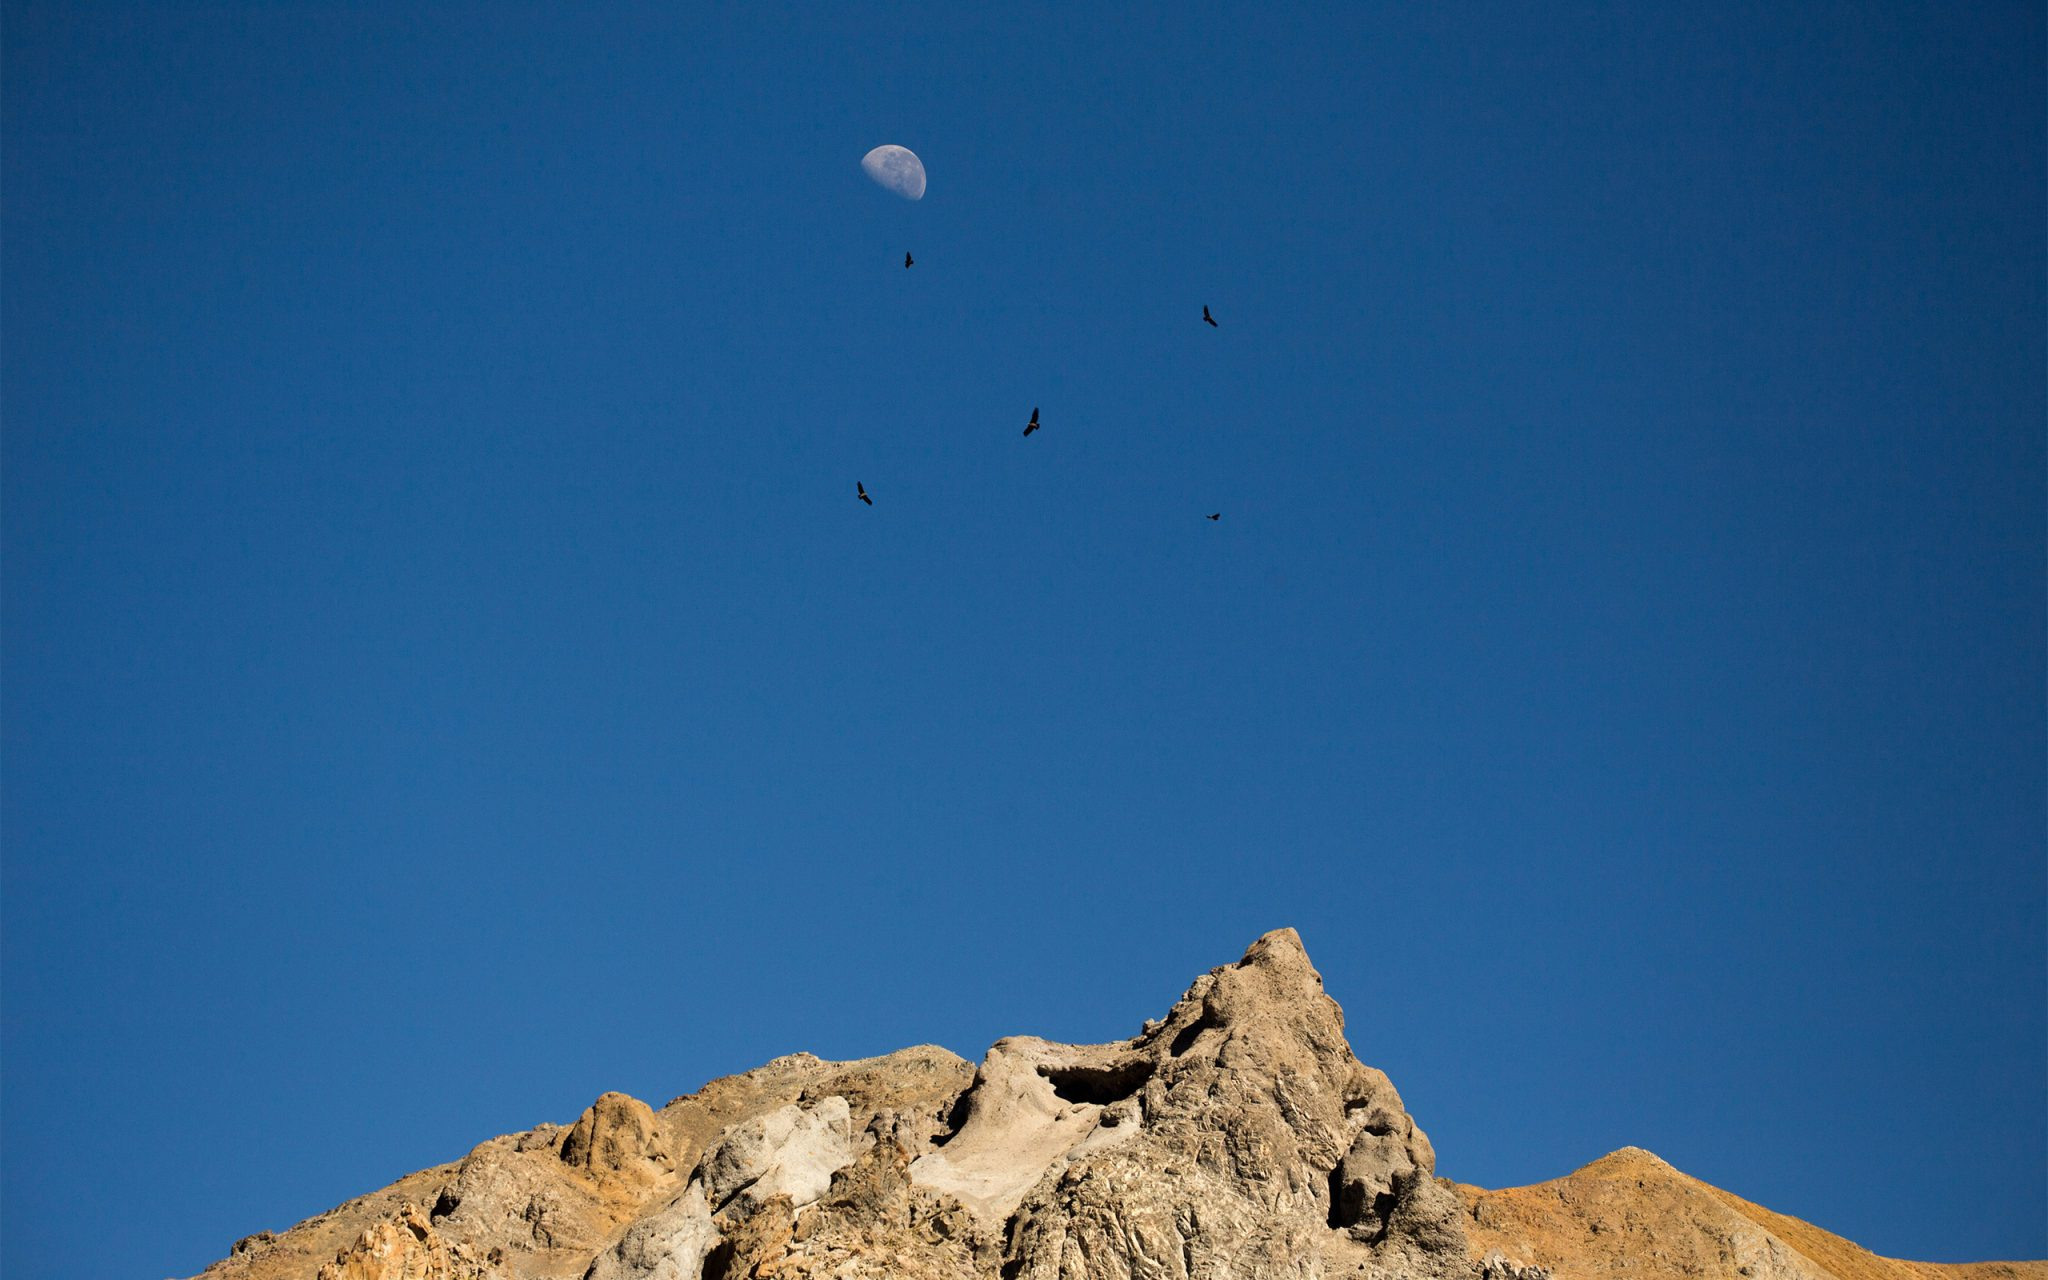 """La luna y los condores""The moon and condors fly high at 4800 metres above the Palacios Glacier in the High Andes in Chile. Carey Marks Photography"